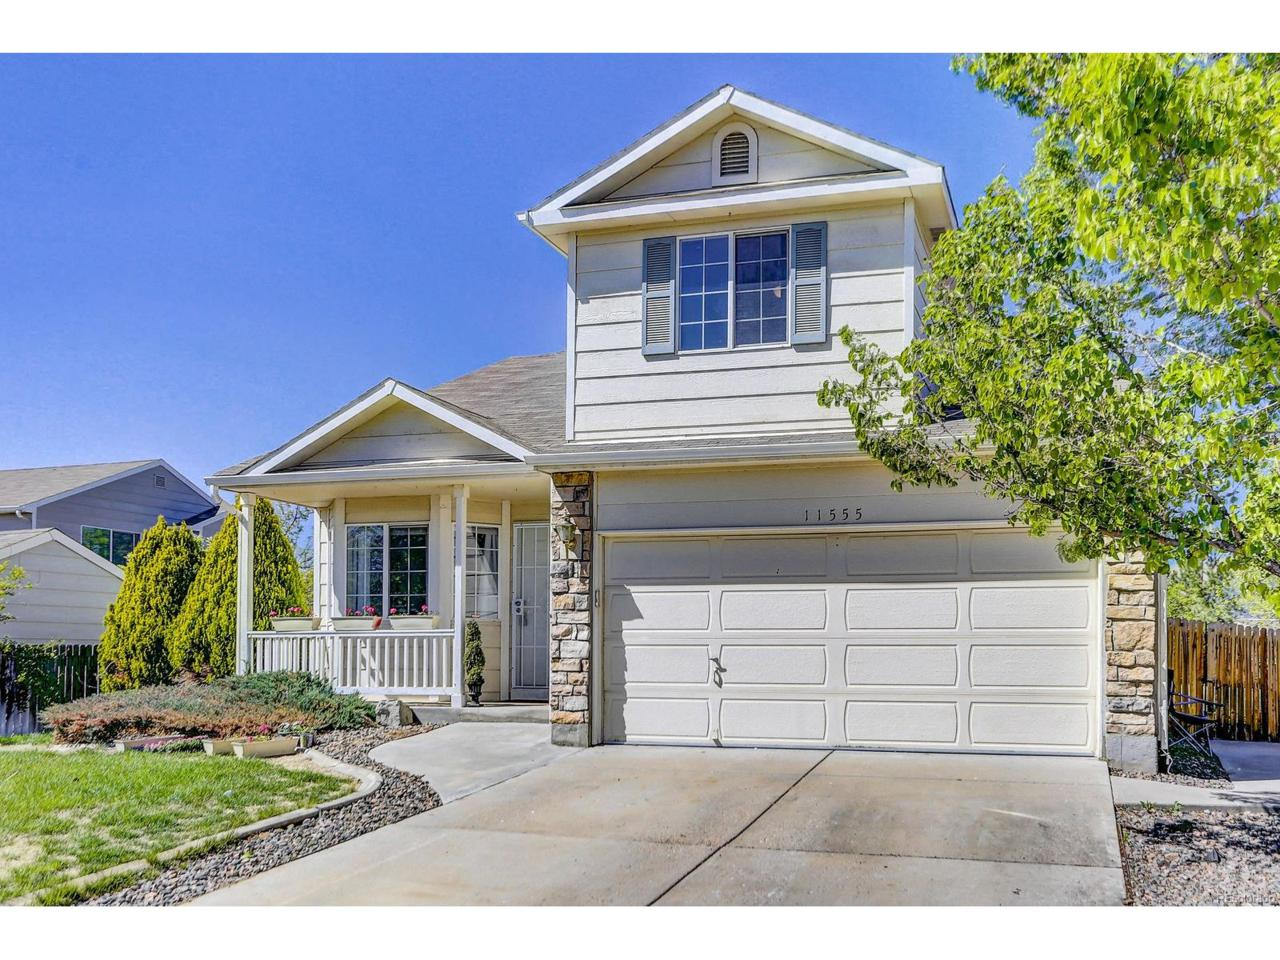 11555 River Run Court, Henderson, CO 80640 (MLS #2914958) :: 8z Real Estate